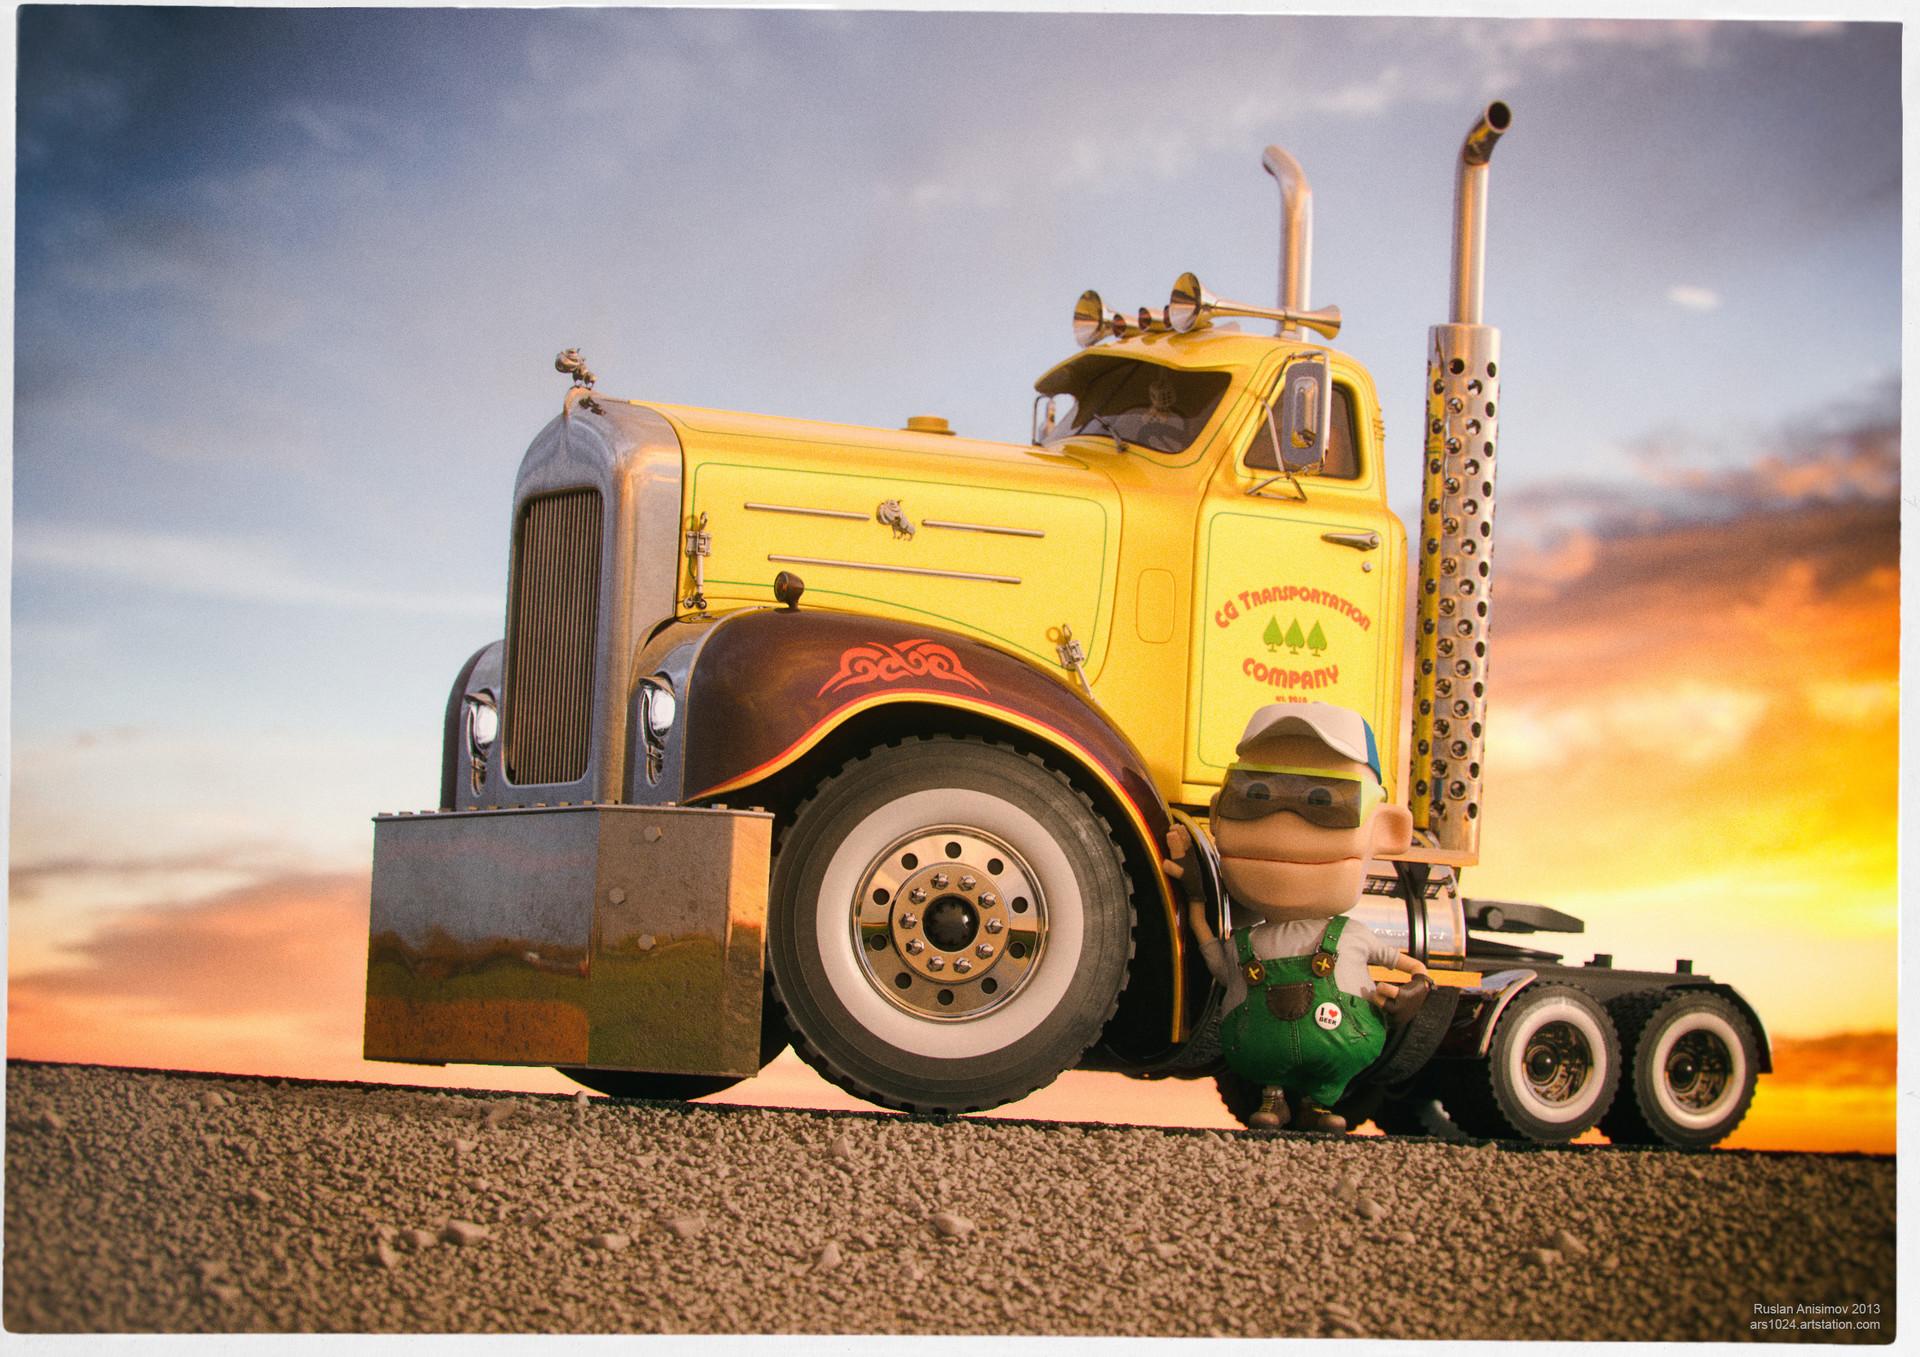 Ruslan anisimov 2013 truck04